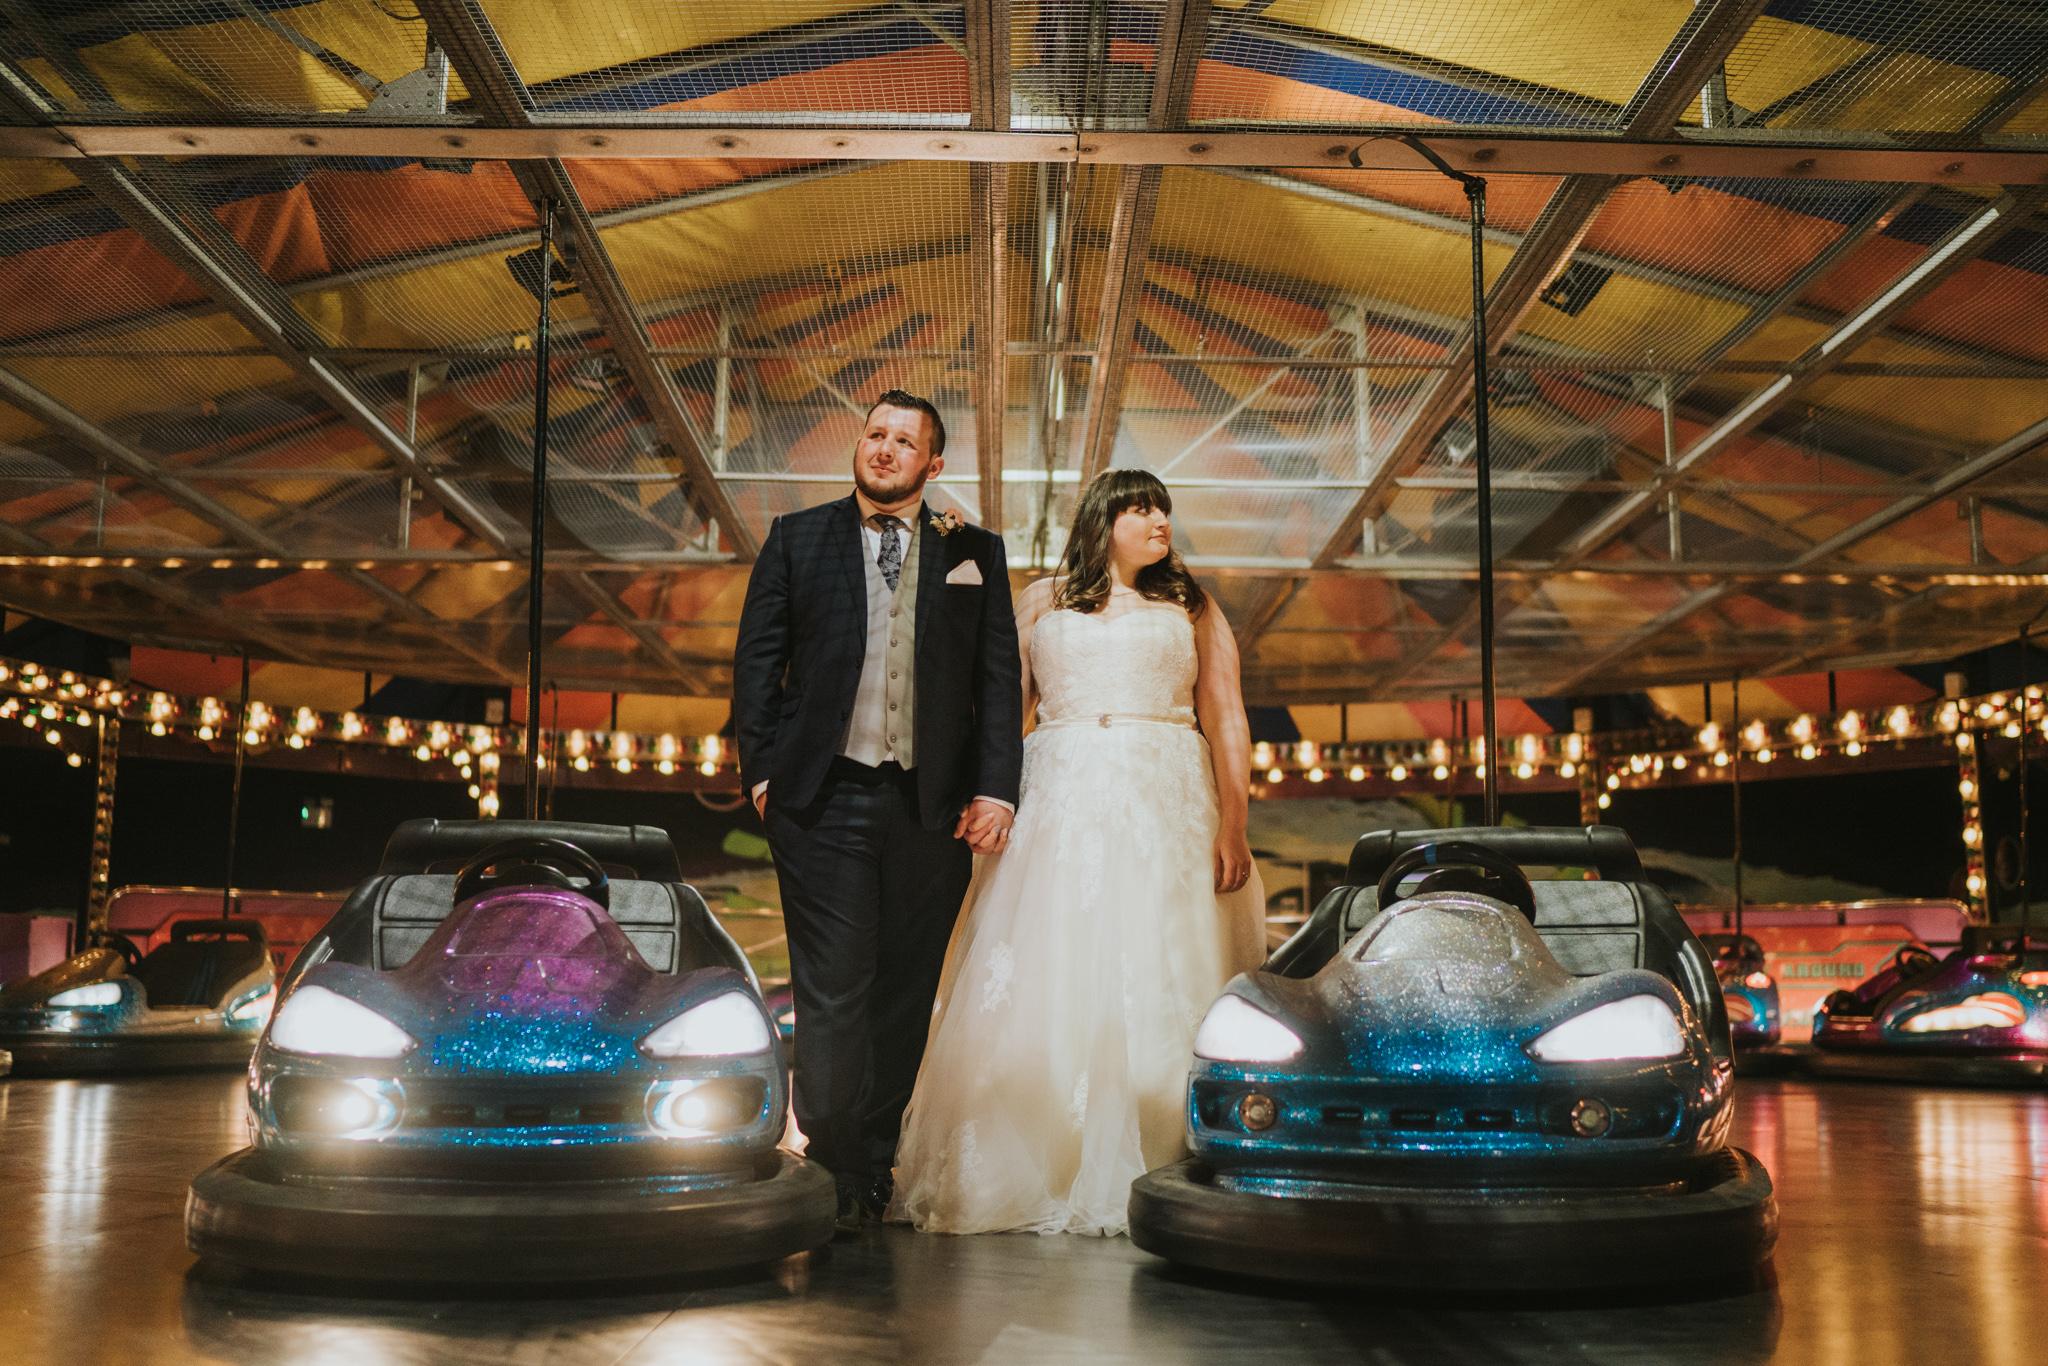 grace-sam-old-barn-clovelly-devon-wedding-photographer-grace-elizabeth-essex-suffolk-norfolk-wedding-photographer (100 of 132).jpg